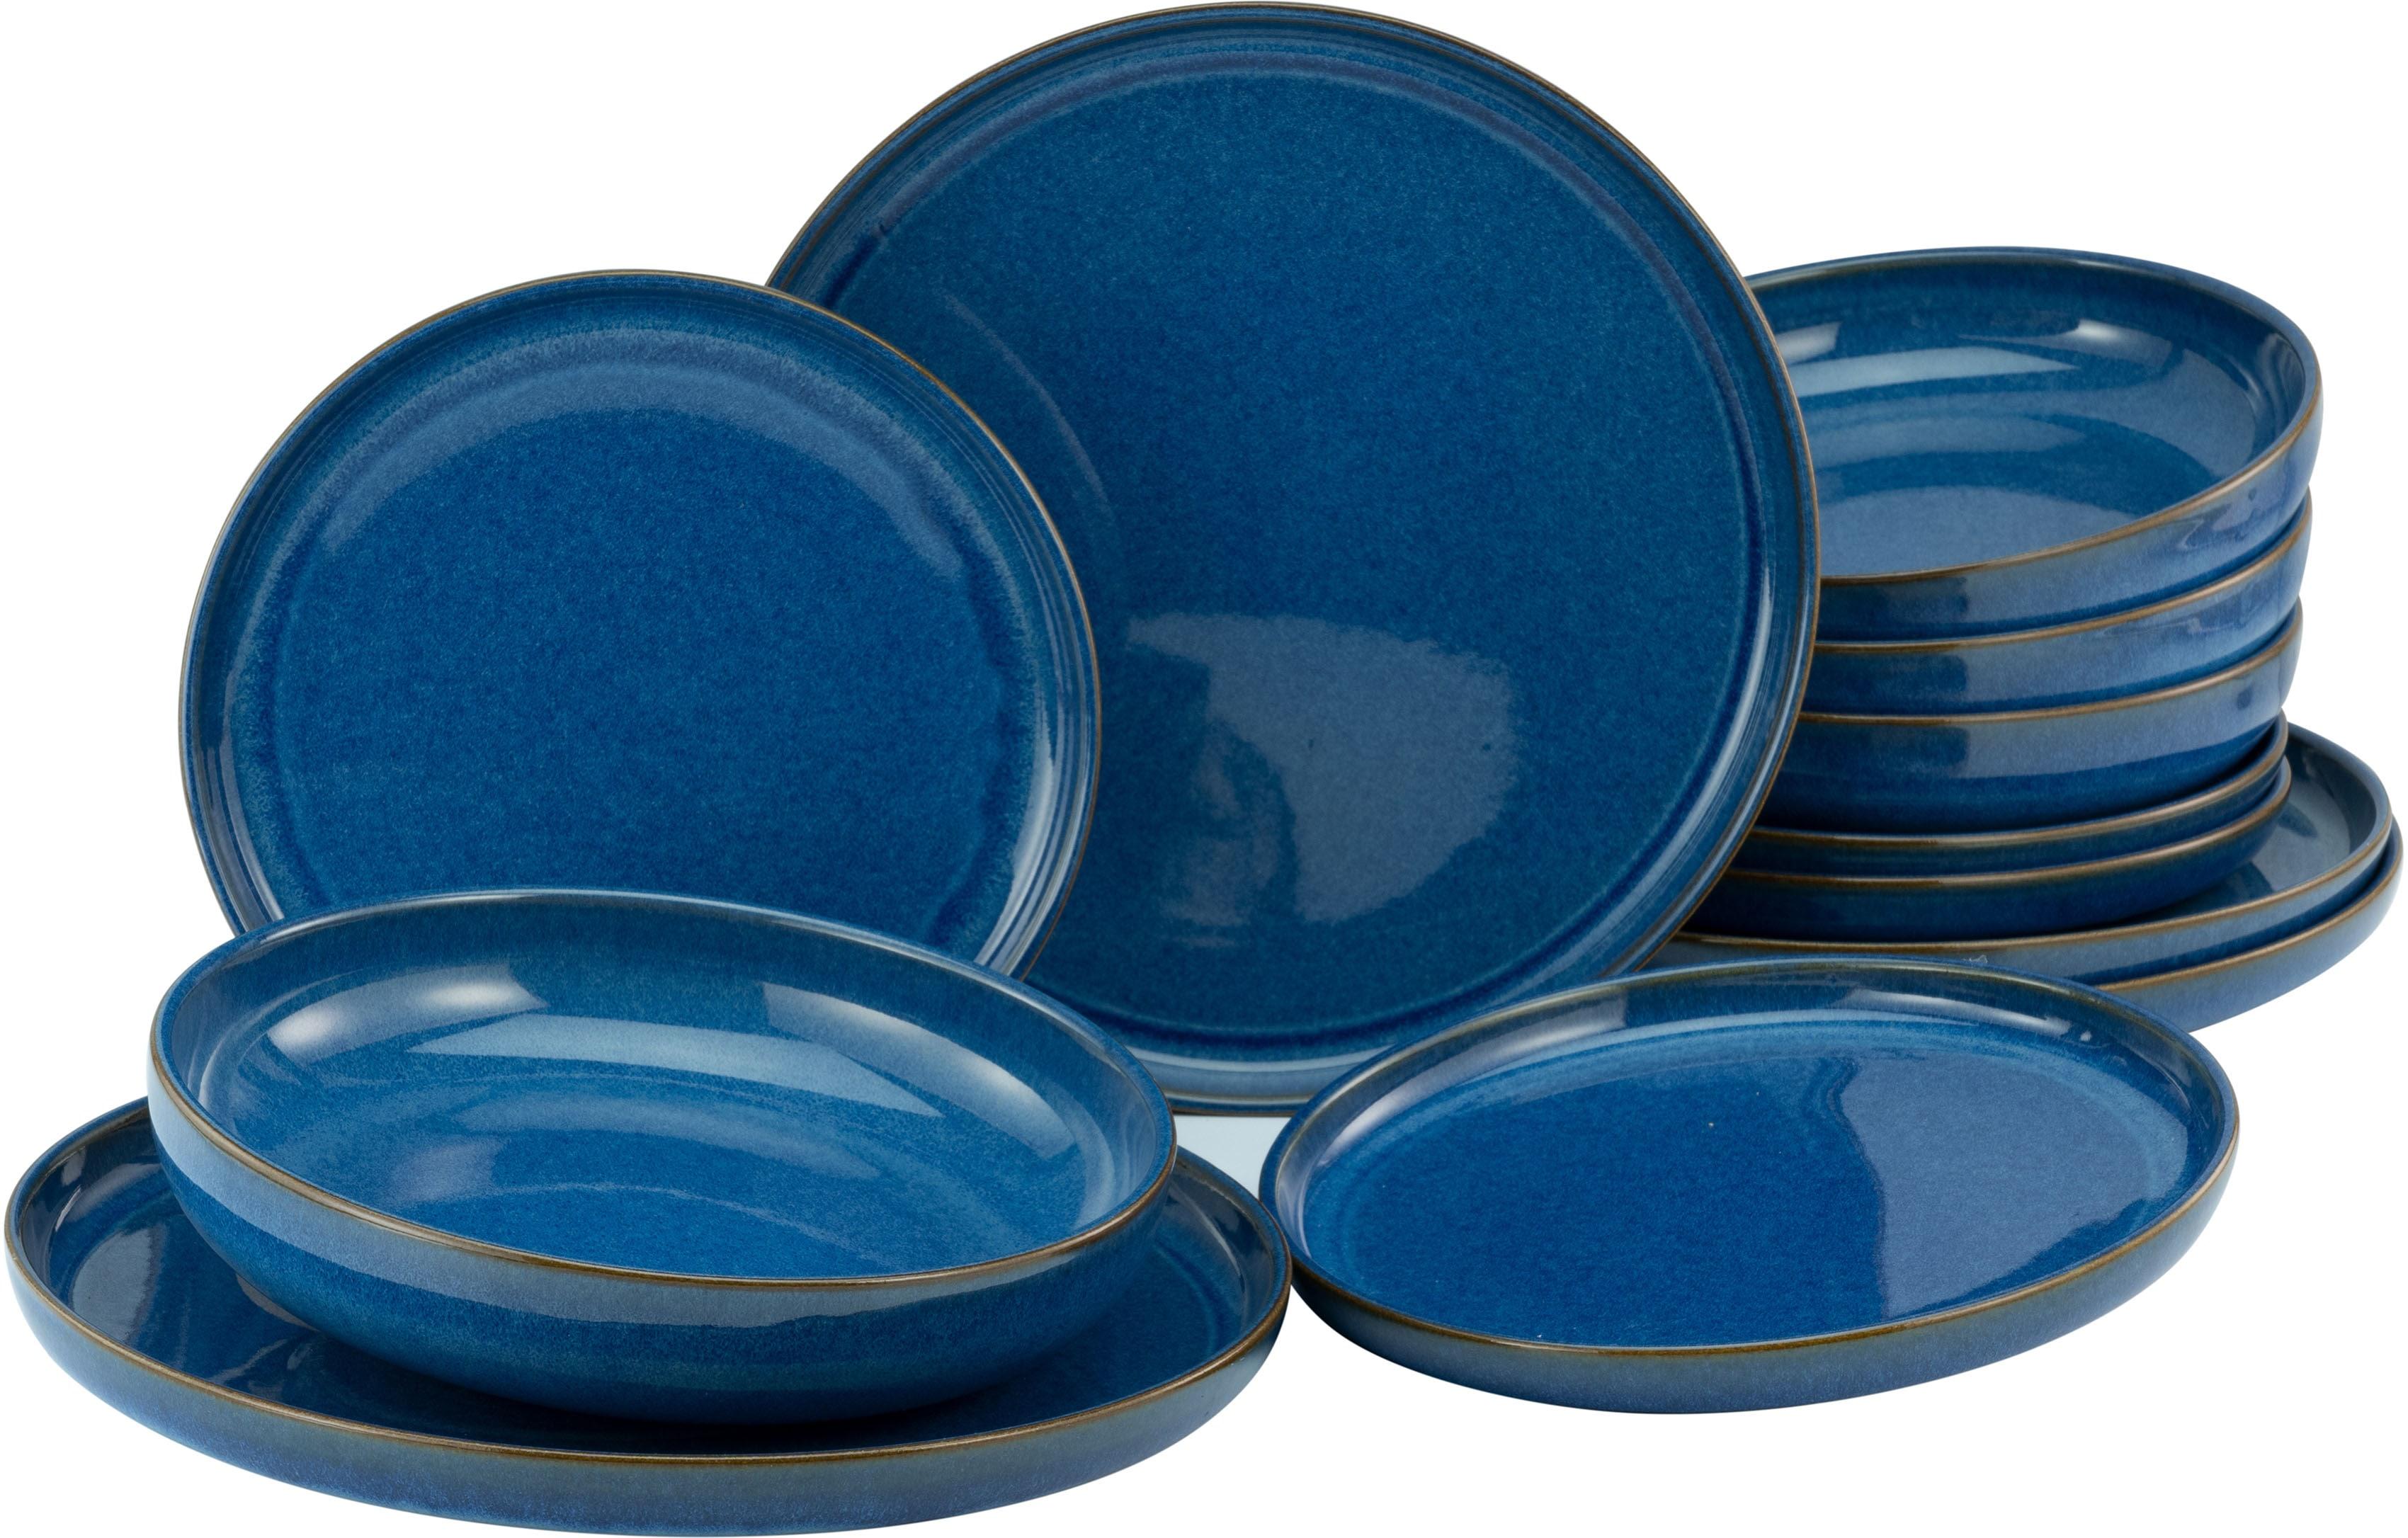 CreaTable Tafelservice Atlantico, (Set, 12 tlg.), mit intensiver Kobalt-Blau-Reaktivglasur blau Geschirr-Sets Geschirr, Porzellan Tischaccessoires Haushaltswaren